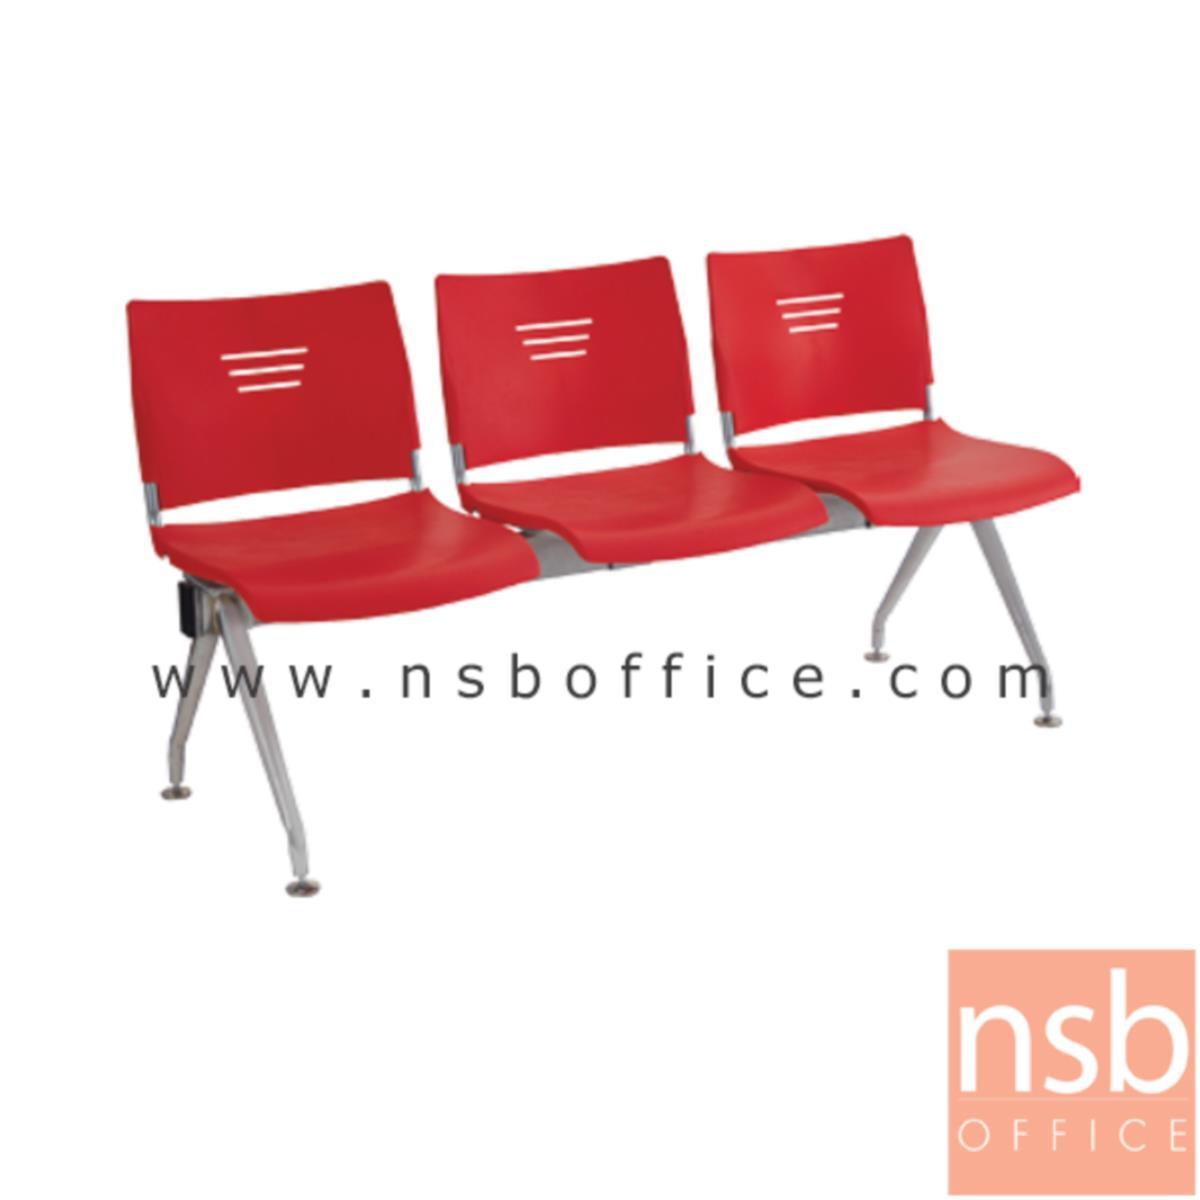 B06A109:เก้าอี้นั่งคอยเฟรมโพลี่ รุ่น CV-089 2 ,3 ,4 ที่นั่ง ขนาด 96W ,146W ,196W cm. ขาเหล็ก